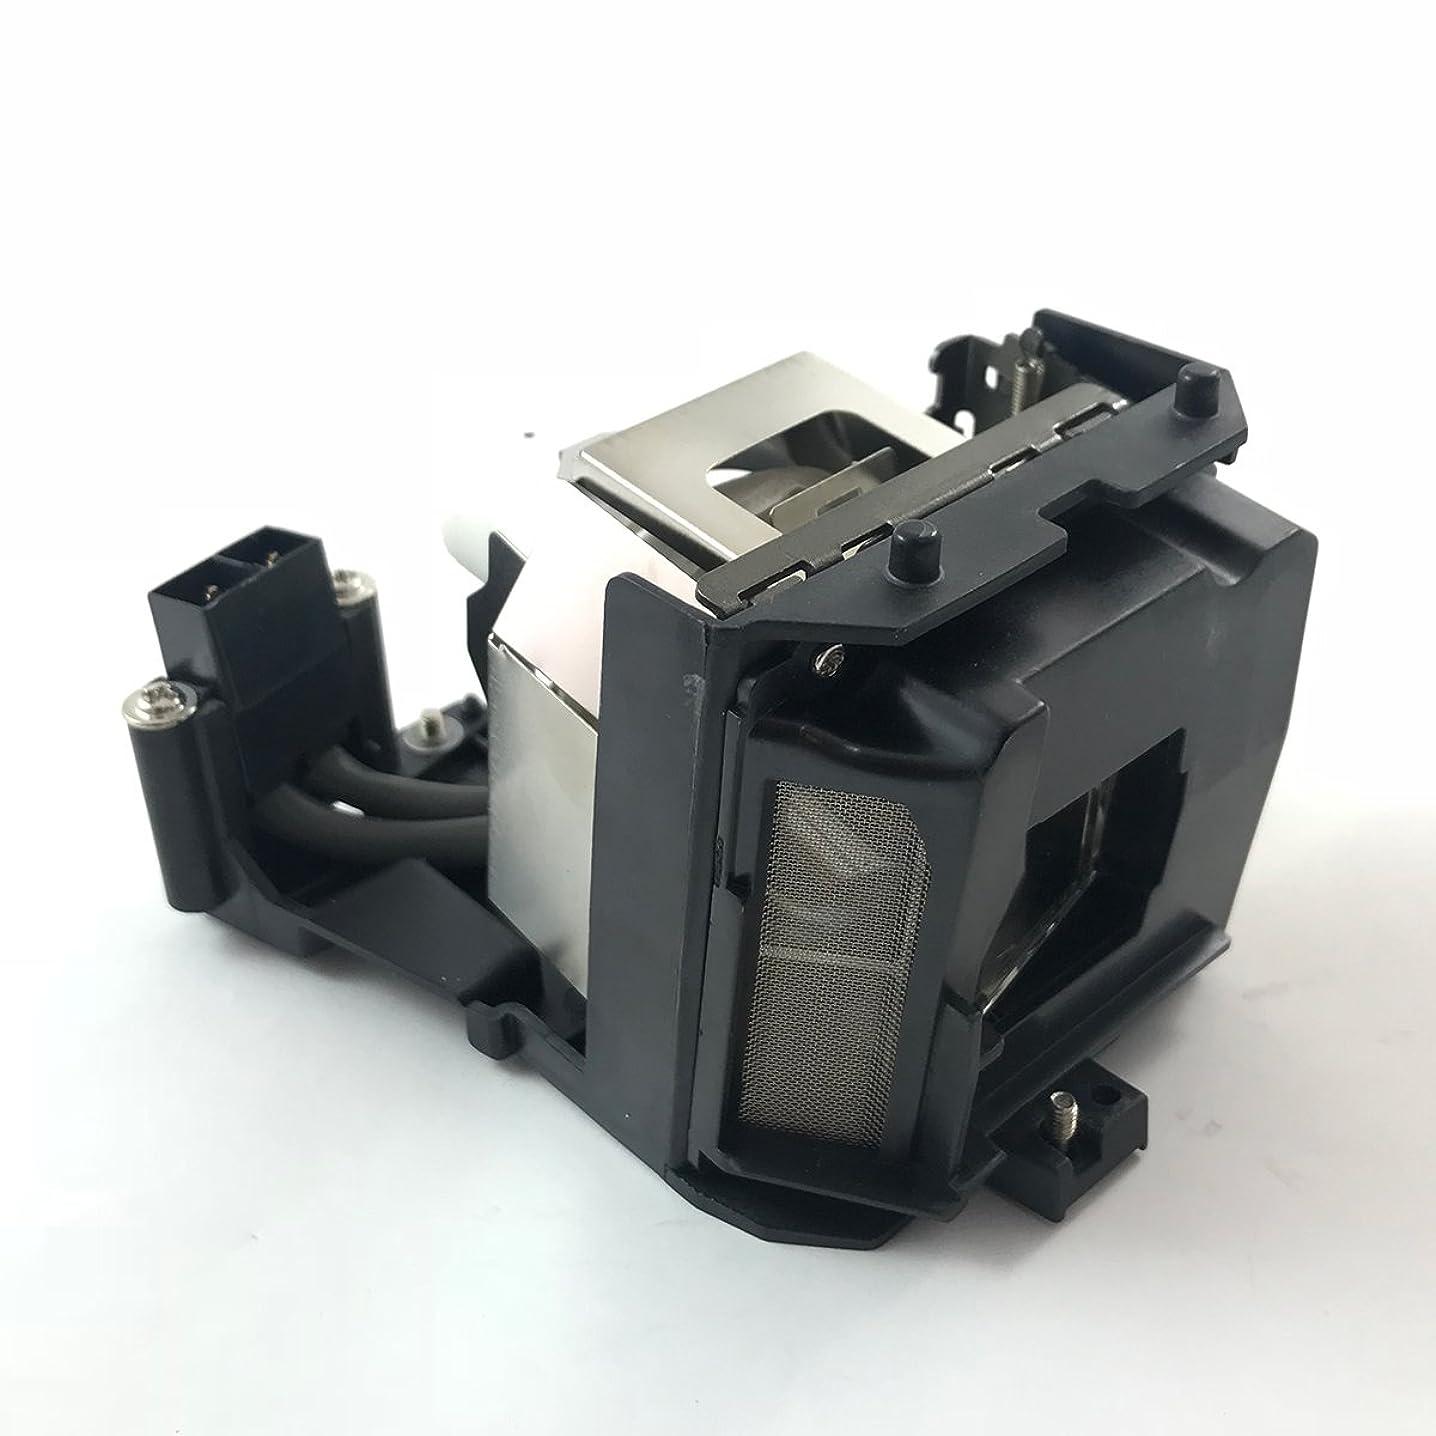 Sharp XR-30X Digital Multimedia Projector Assembly with Original Bulb Inside